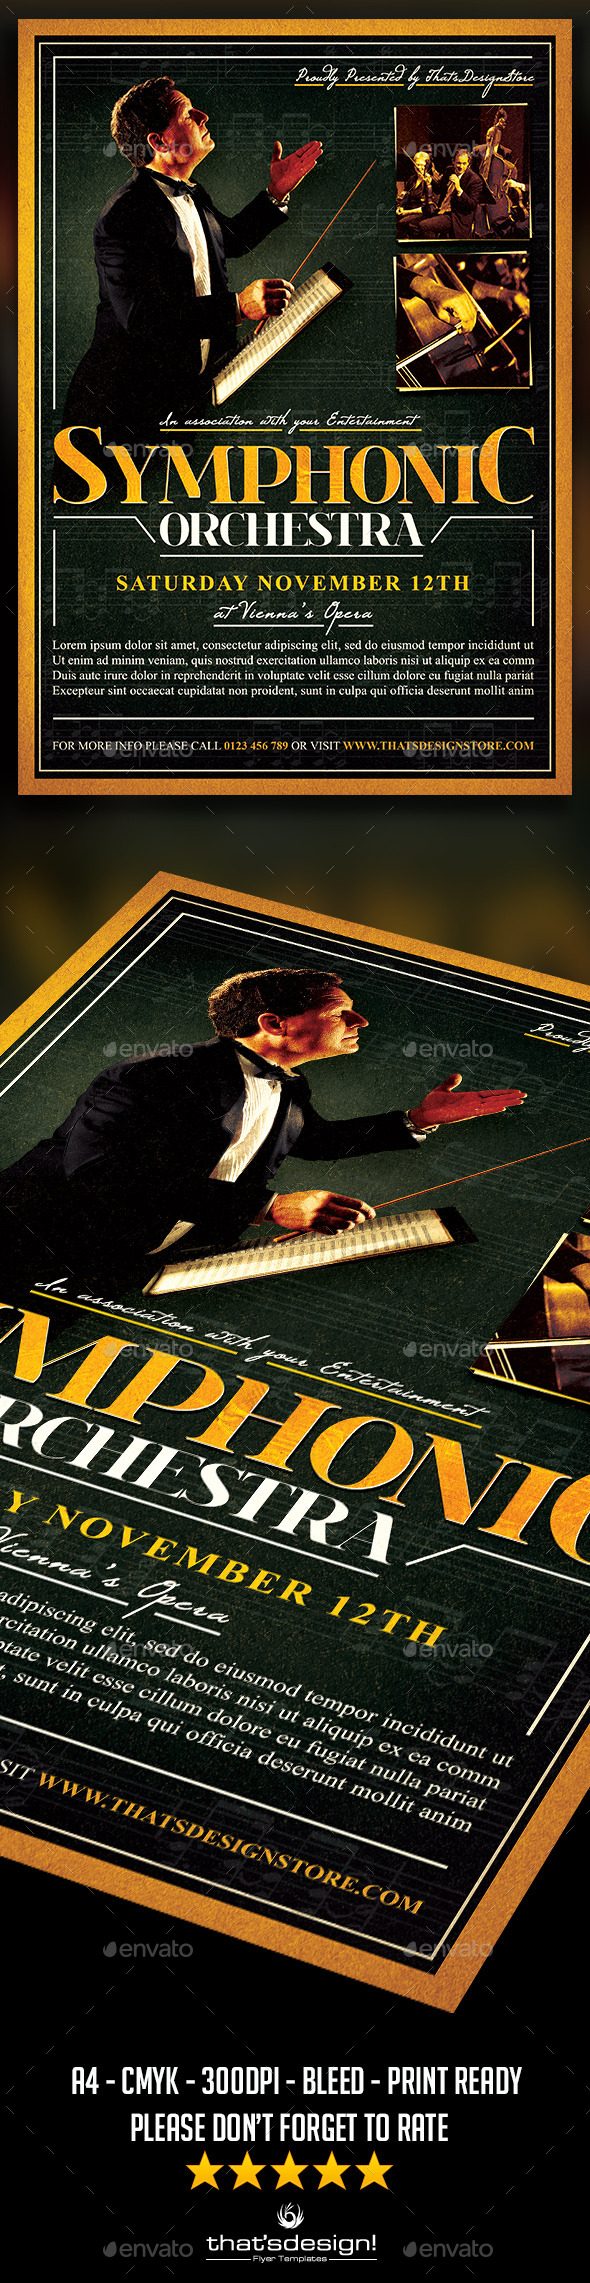 GraphicRiver Symphonic Orchestra Flyer Template V2 11882118